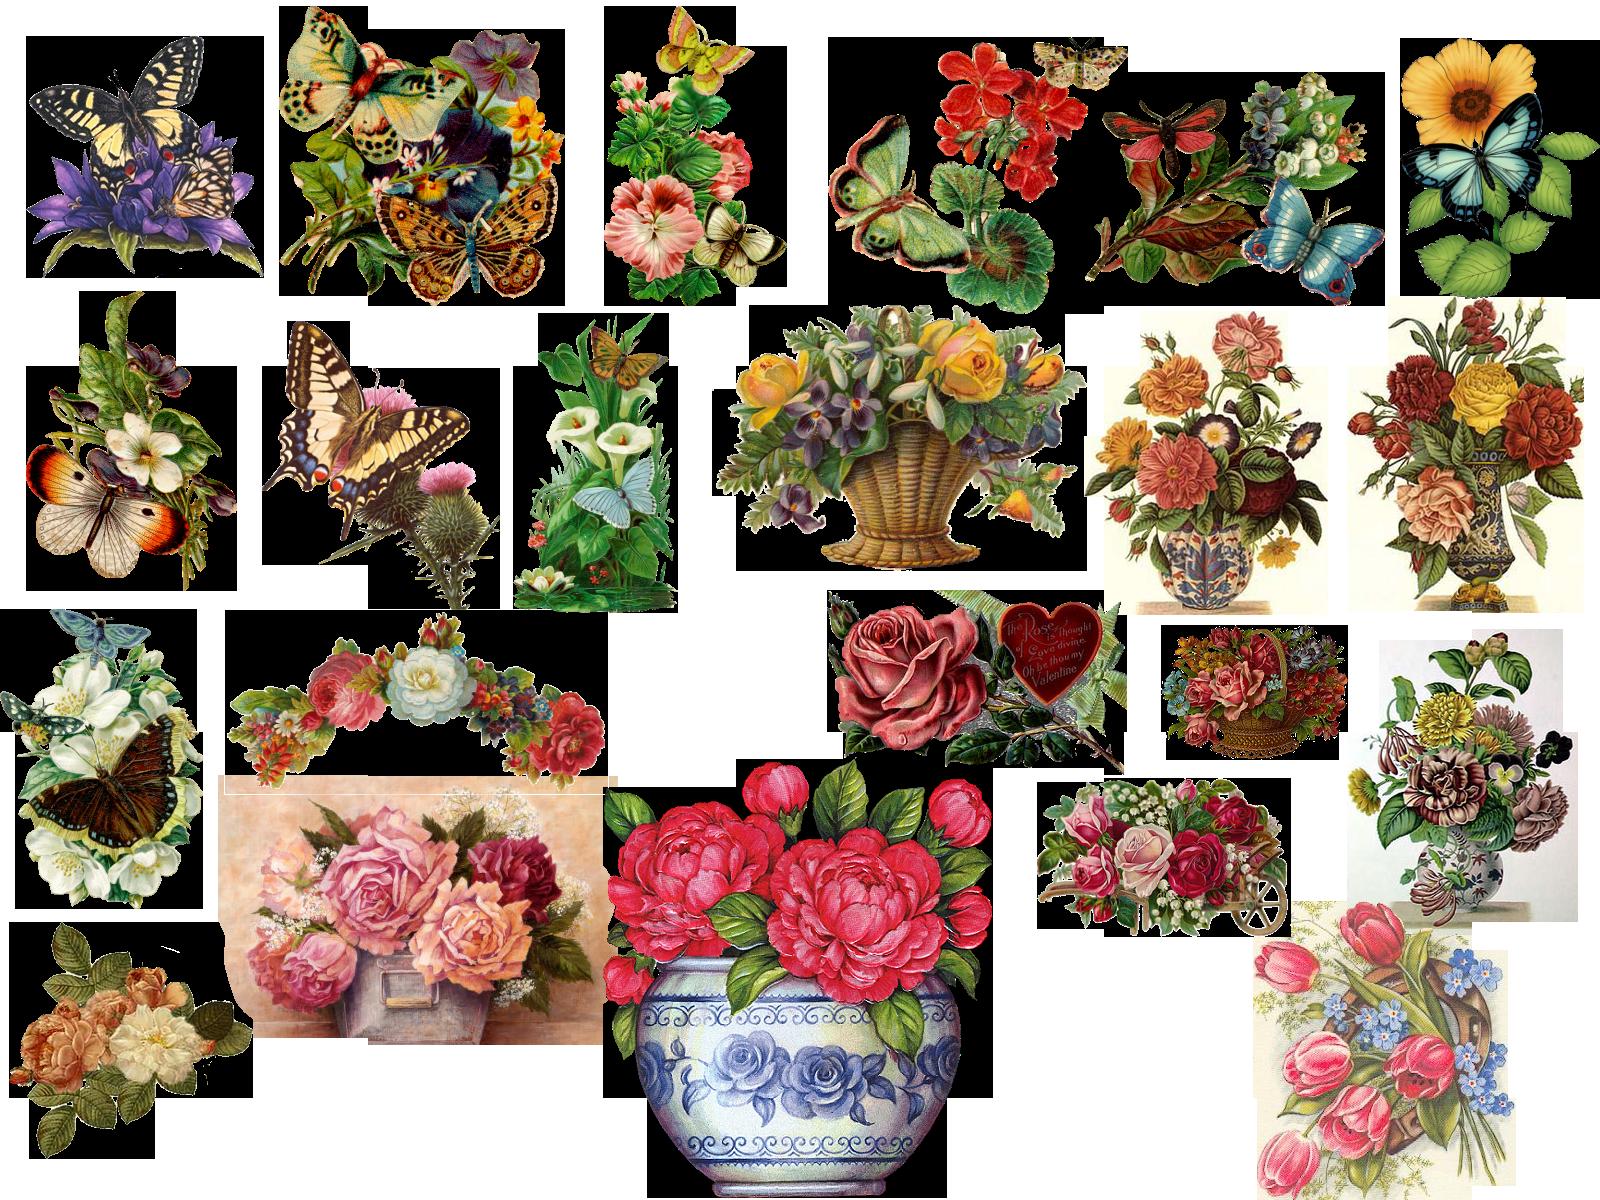 Vintage flowers clip art borders vintage flowers by hasiyne vintage flowers clip art borders vintage flowers by hasiyne dhlflorist Image collections